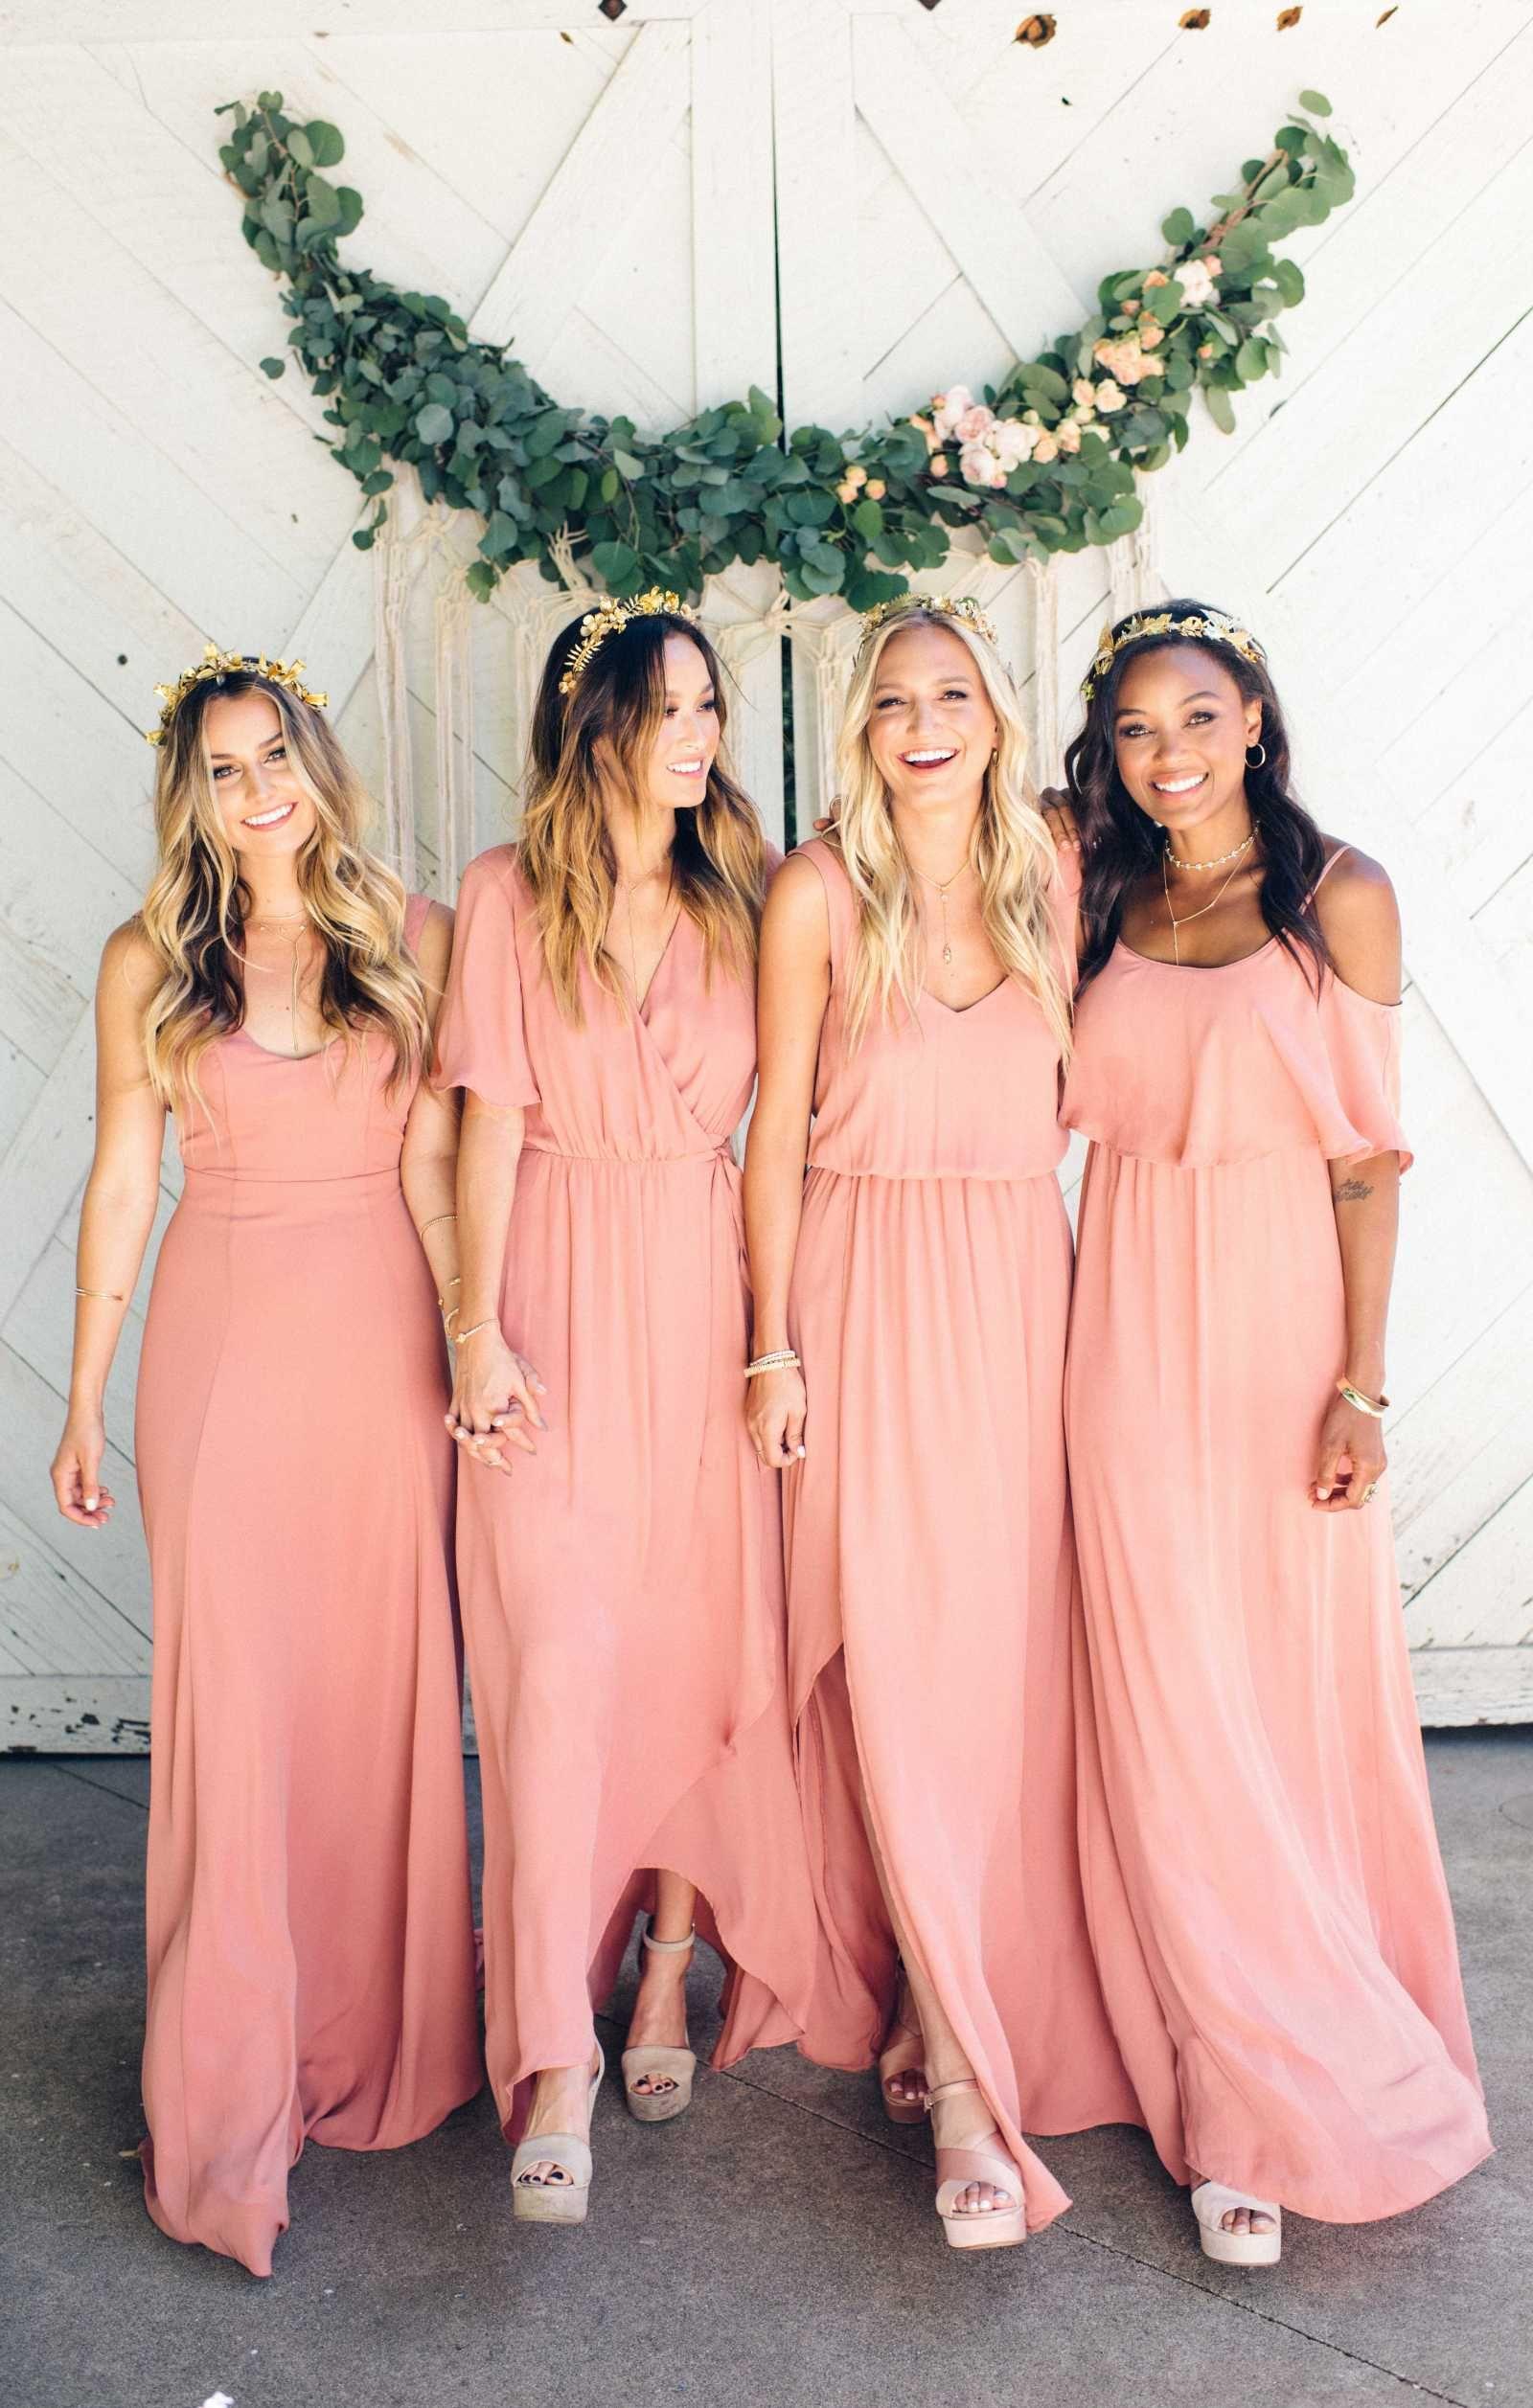 Estilismo para Damas de honor en tu boda | Pinterest | Damitas de ...